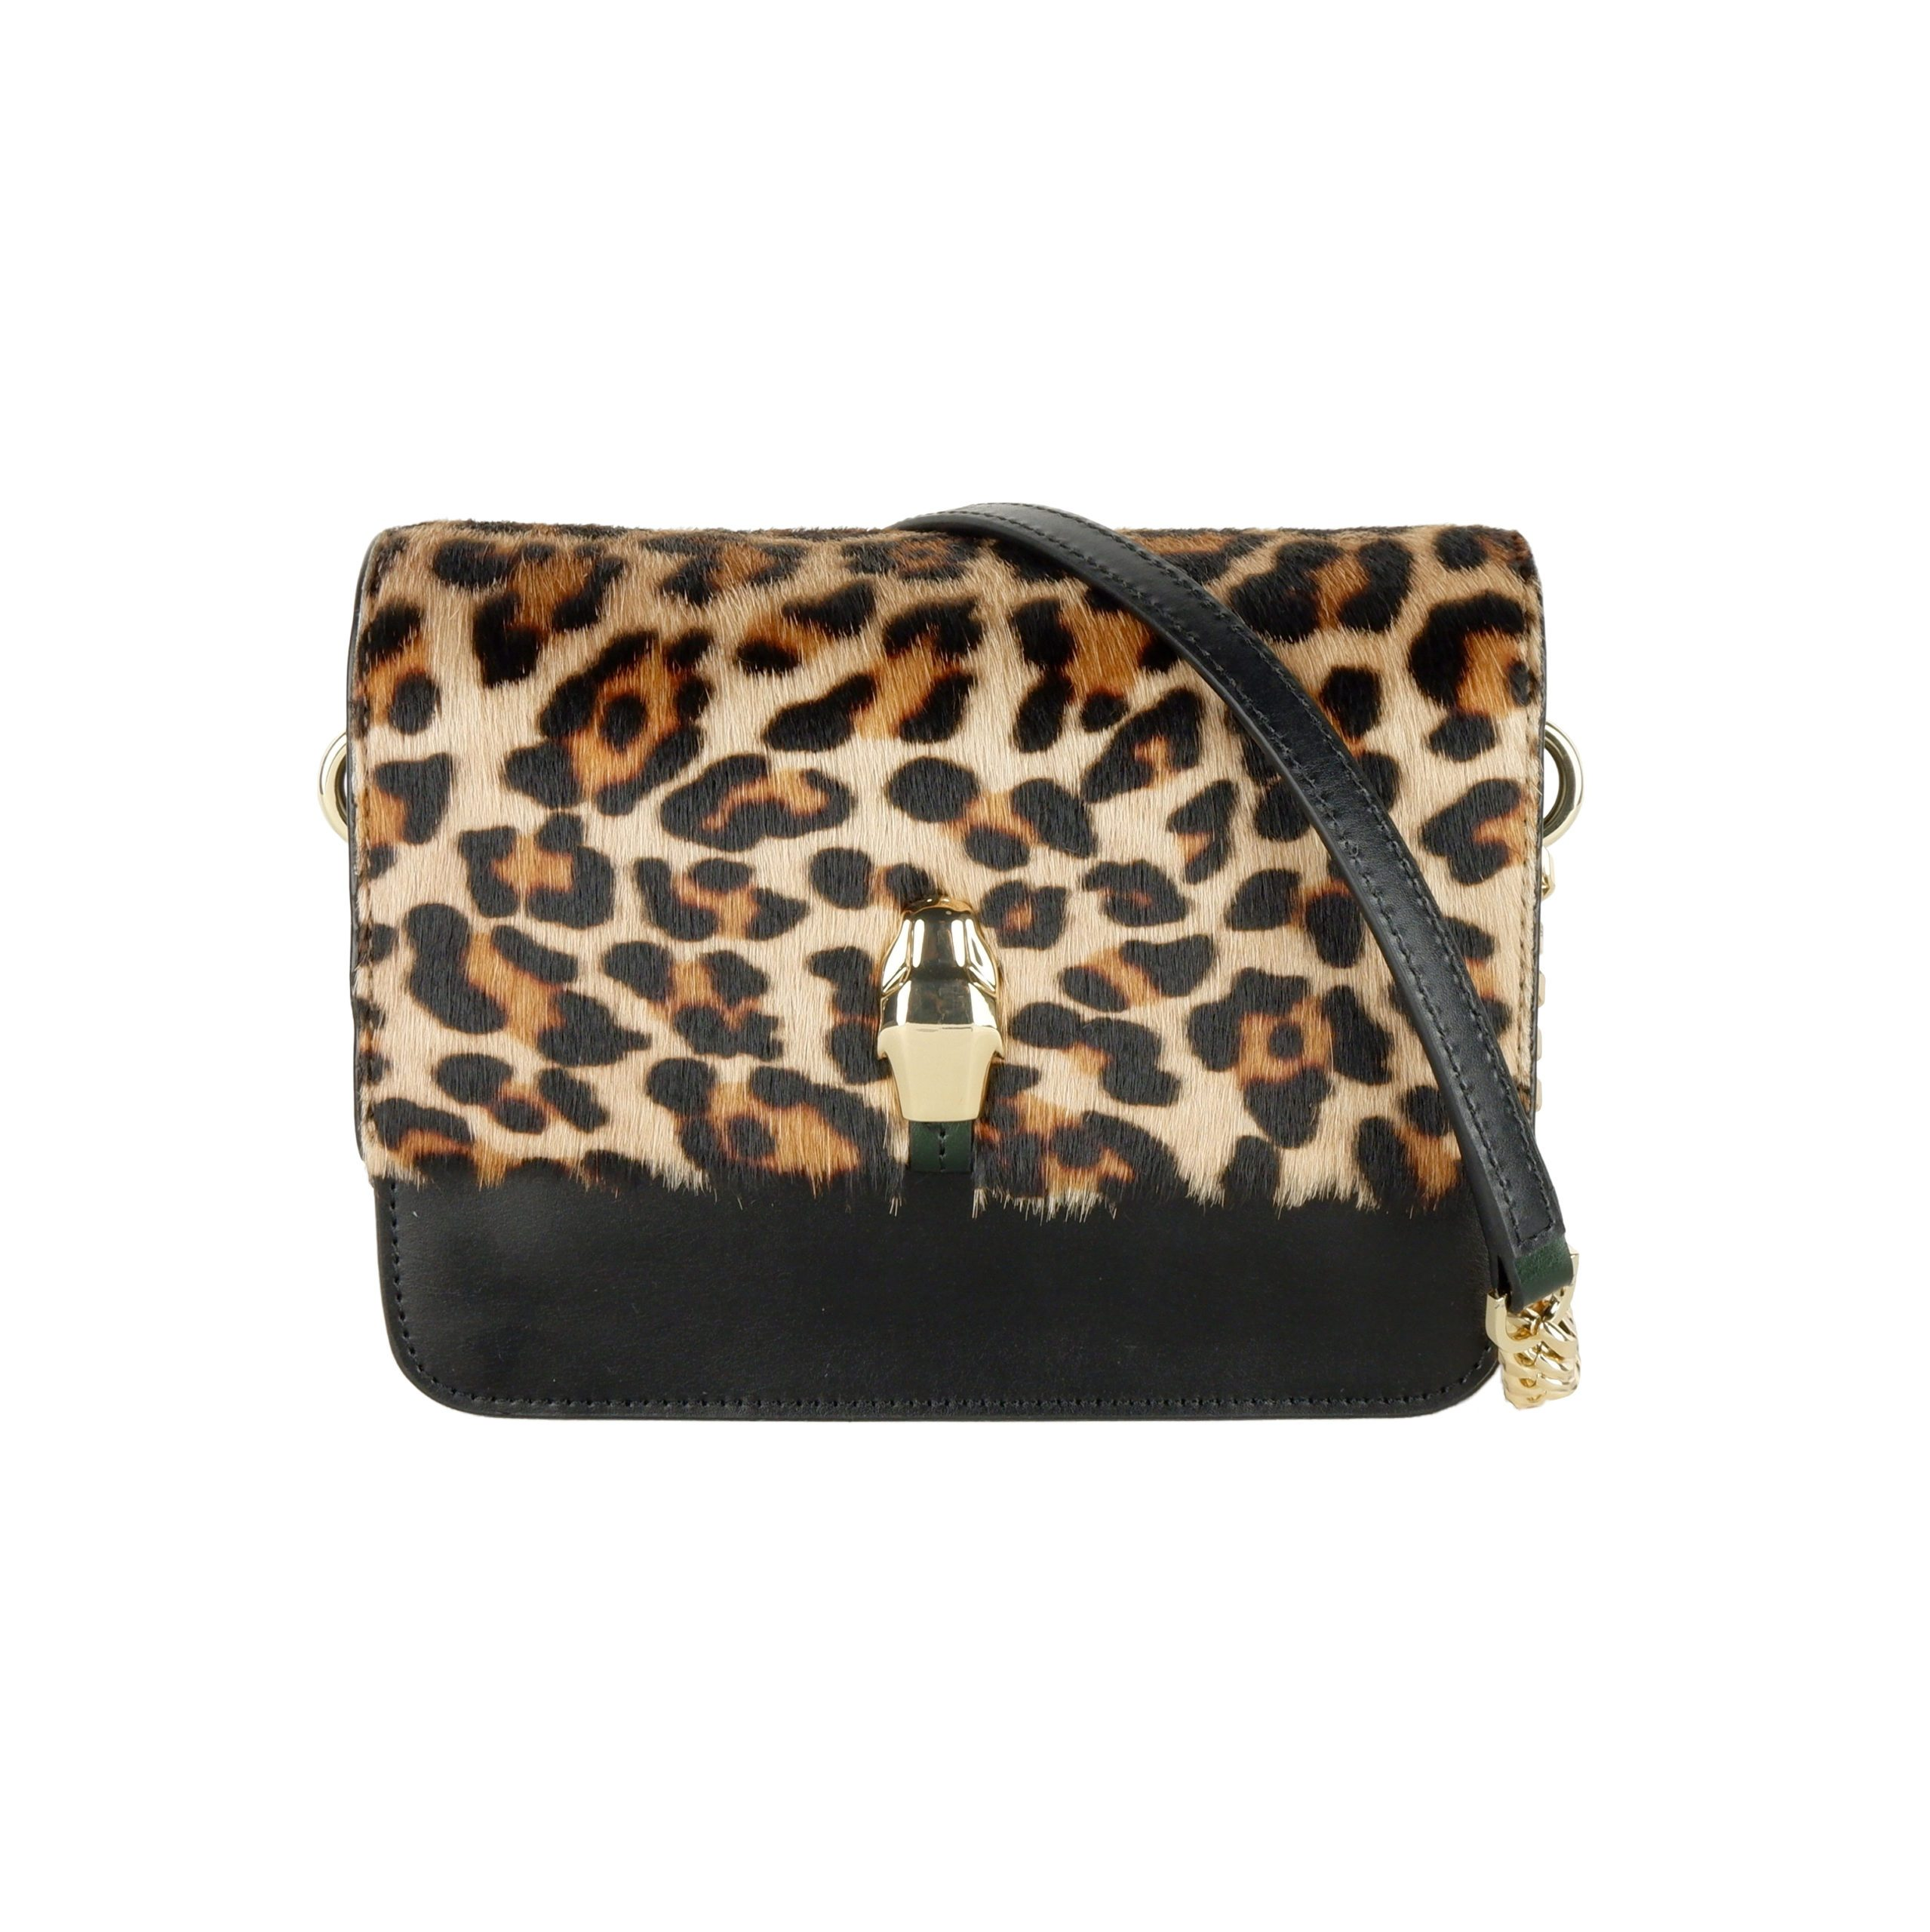 Cavalli Class Women's Shoulder Bag Multicolor CA1421141